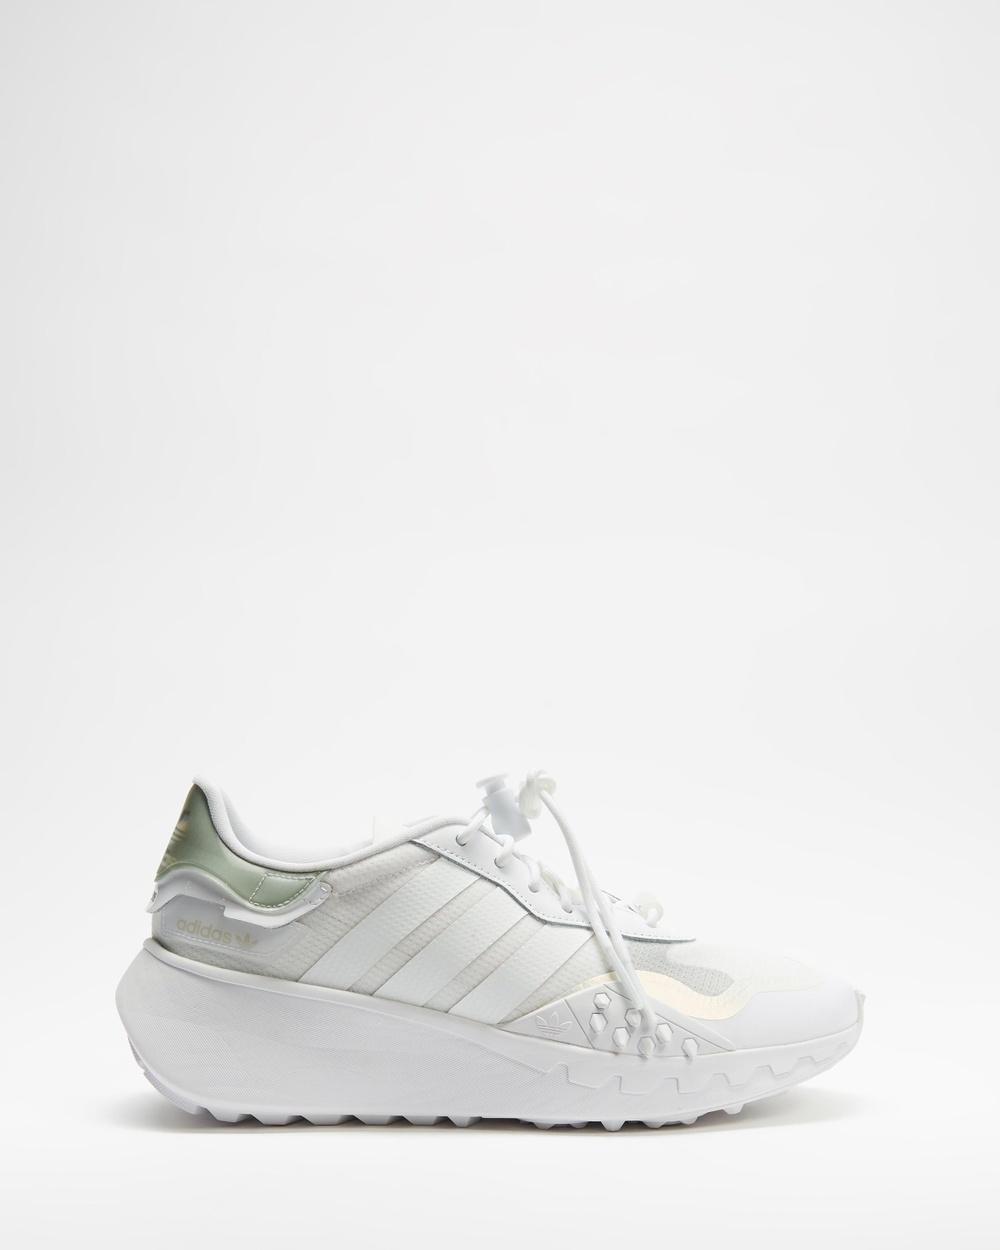 adidas Originals Choigo Women's Lifestyle Sneakers Footwear White & Silver Metallic